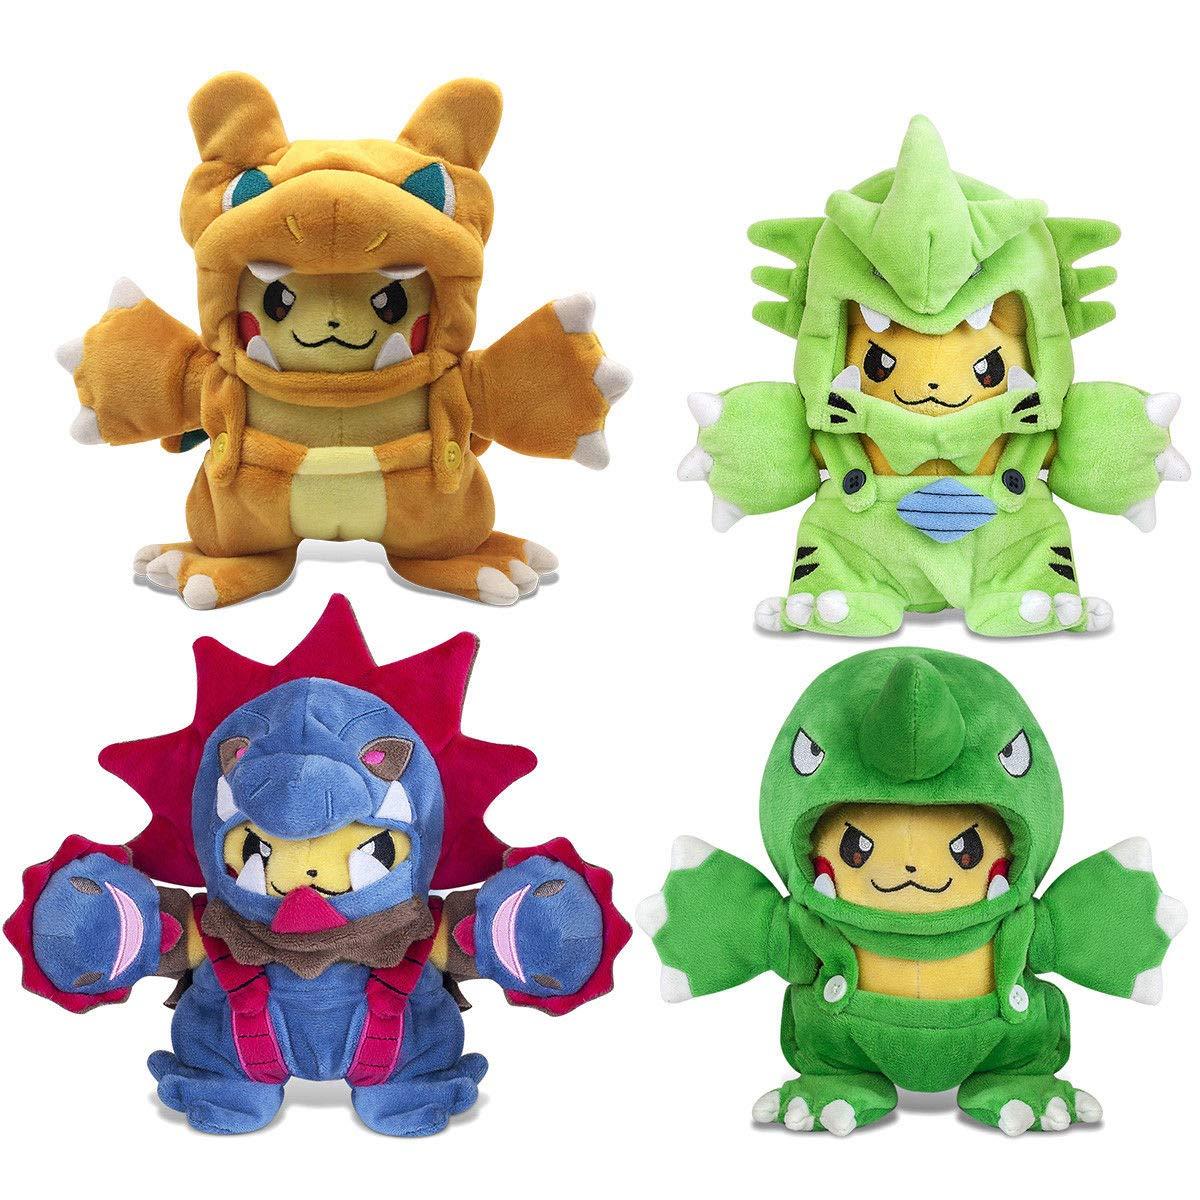 D-Khaleesi Hydreigon/Charizard Pikachu, Tyranitar PoManiac Pikachu Figure Animal Toys Plush Doll 8 inches Collectable Xmas Gift Set of 4 by D-Khaleesi